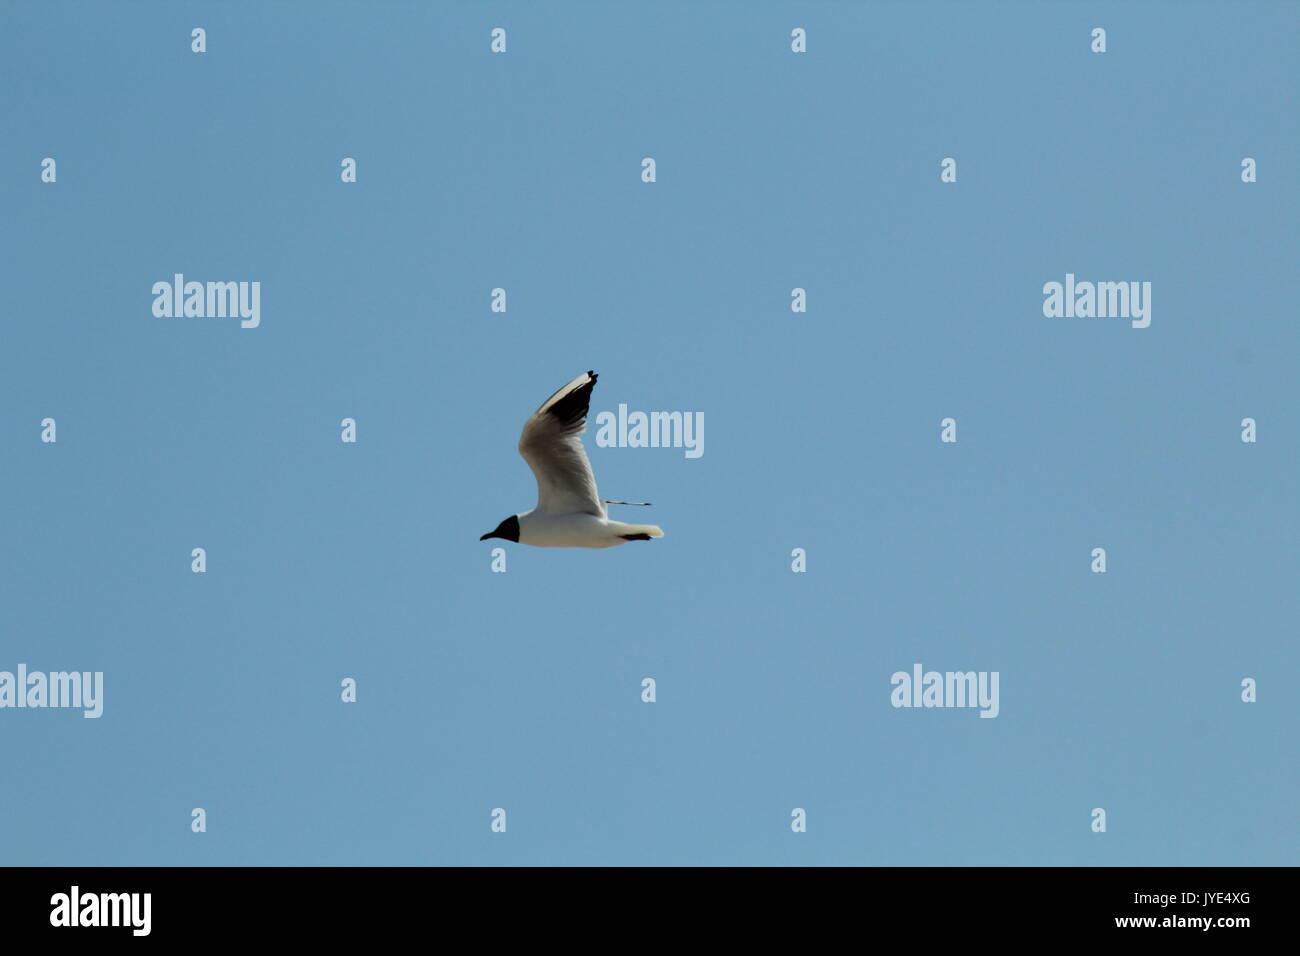 seagull flying through blue sky - Stock Image